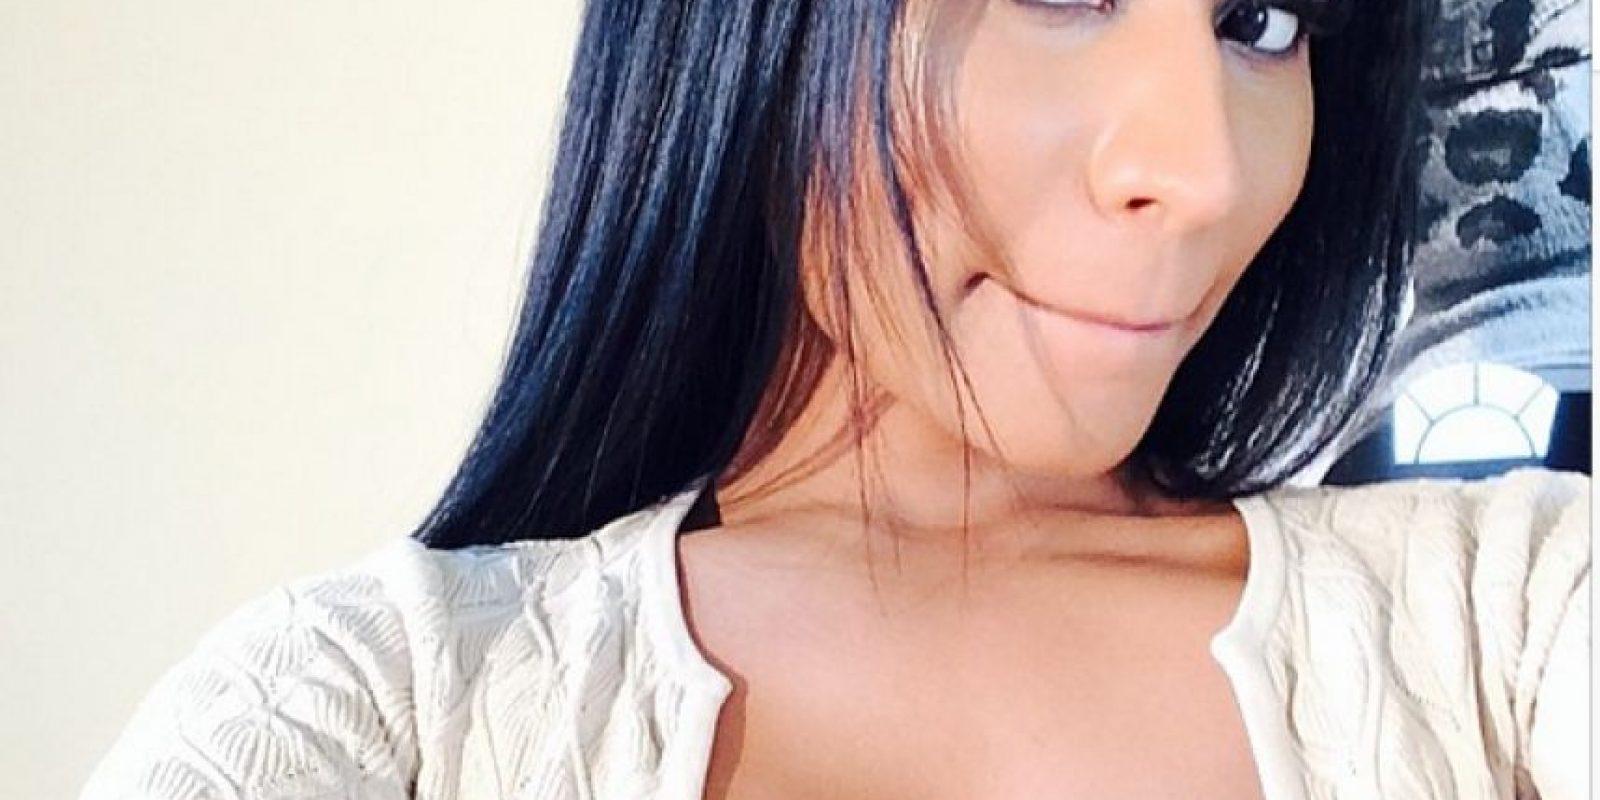 Nicki Minaj ha ganado seis BET Awards y cuatro American Music Awards Foto:Instagram @nickiminaj